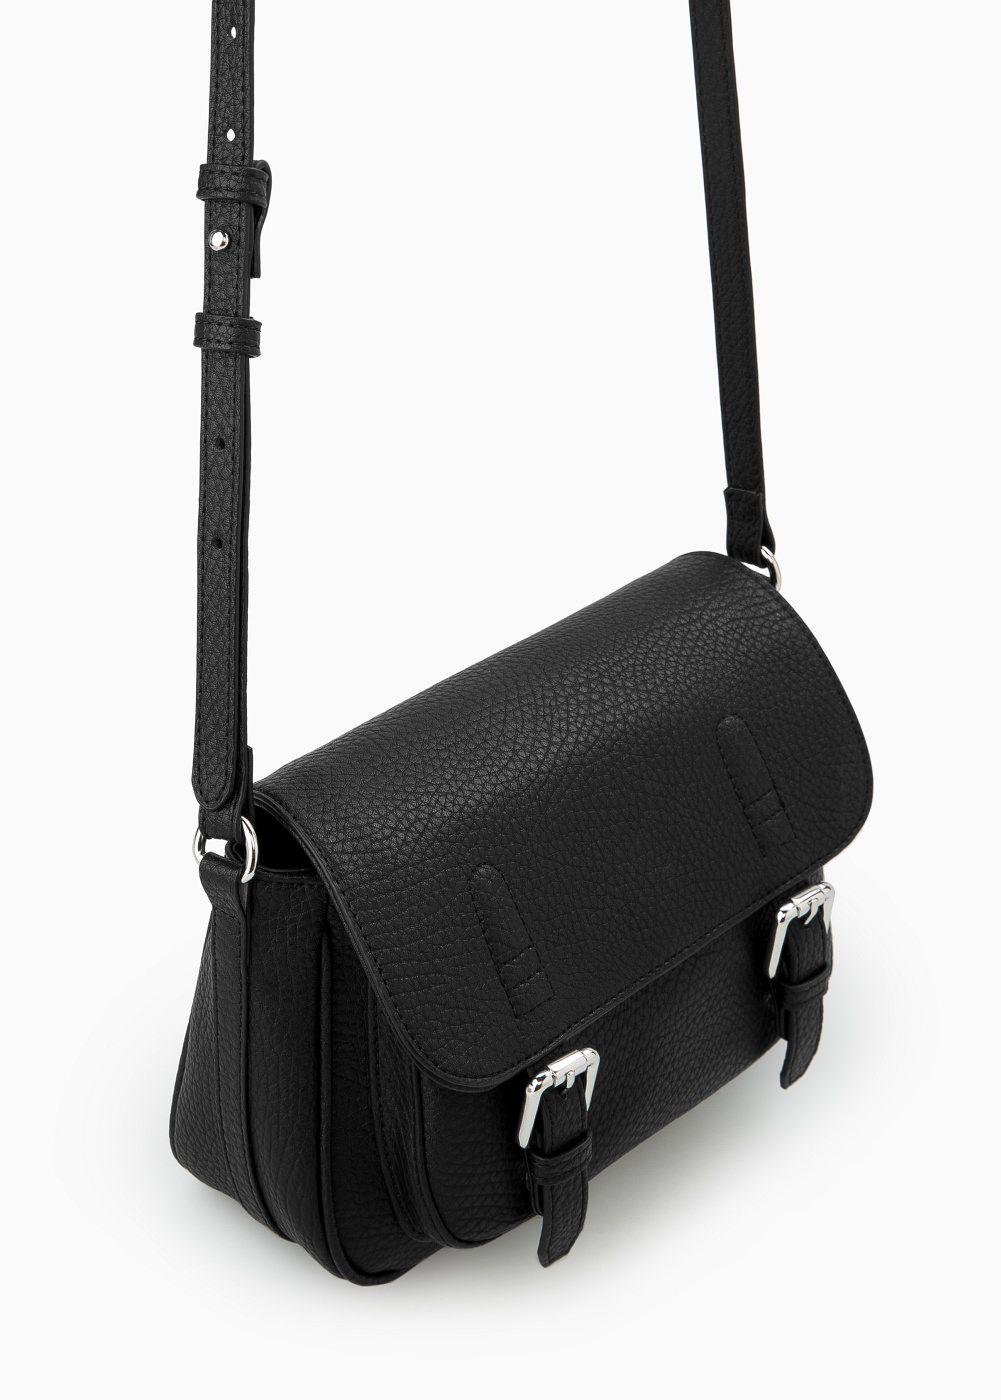 Mango Small Satchel Bag in Black | Lyst